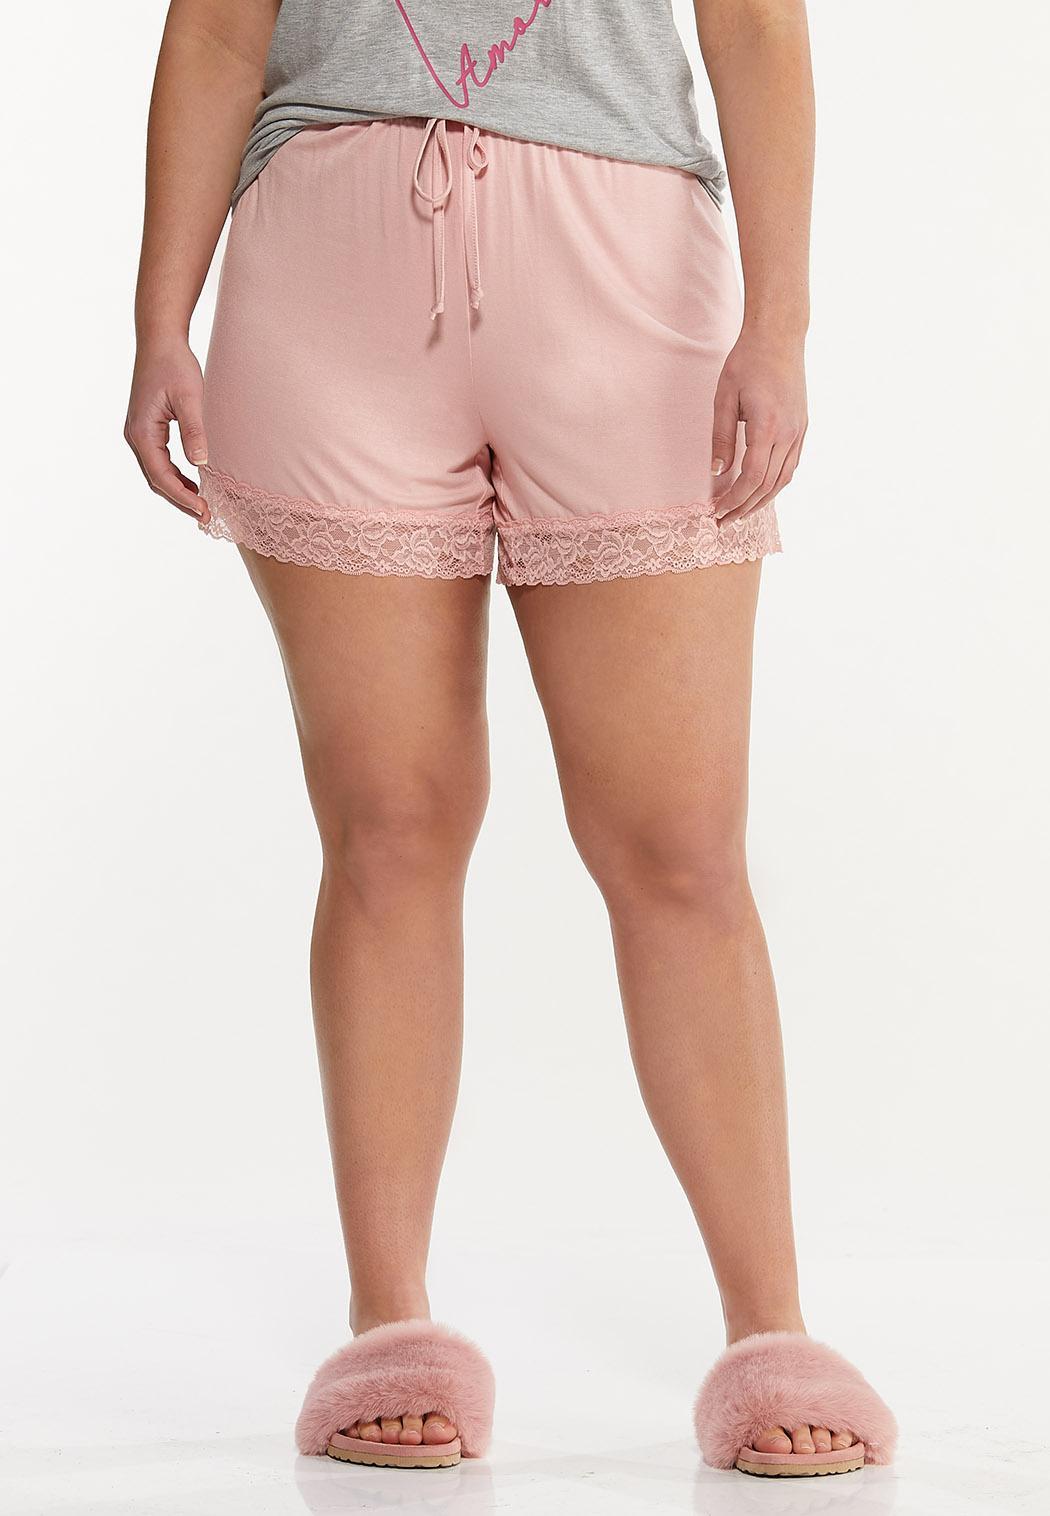 Plus Size Lace Trim Sleep Shorts